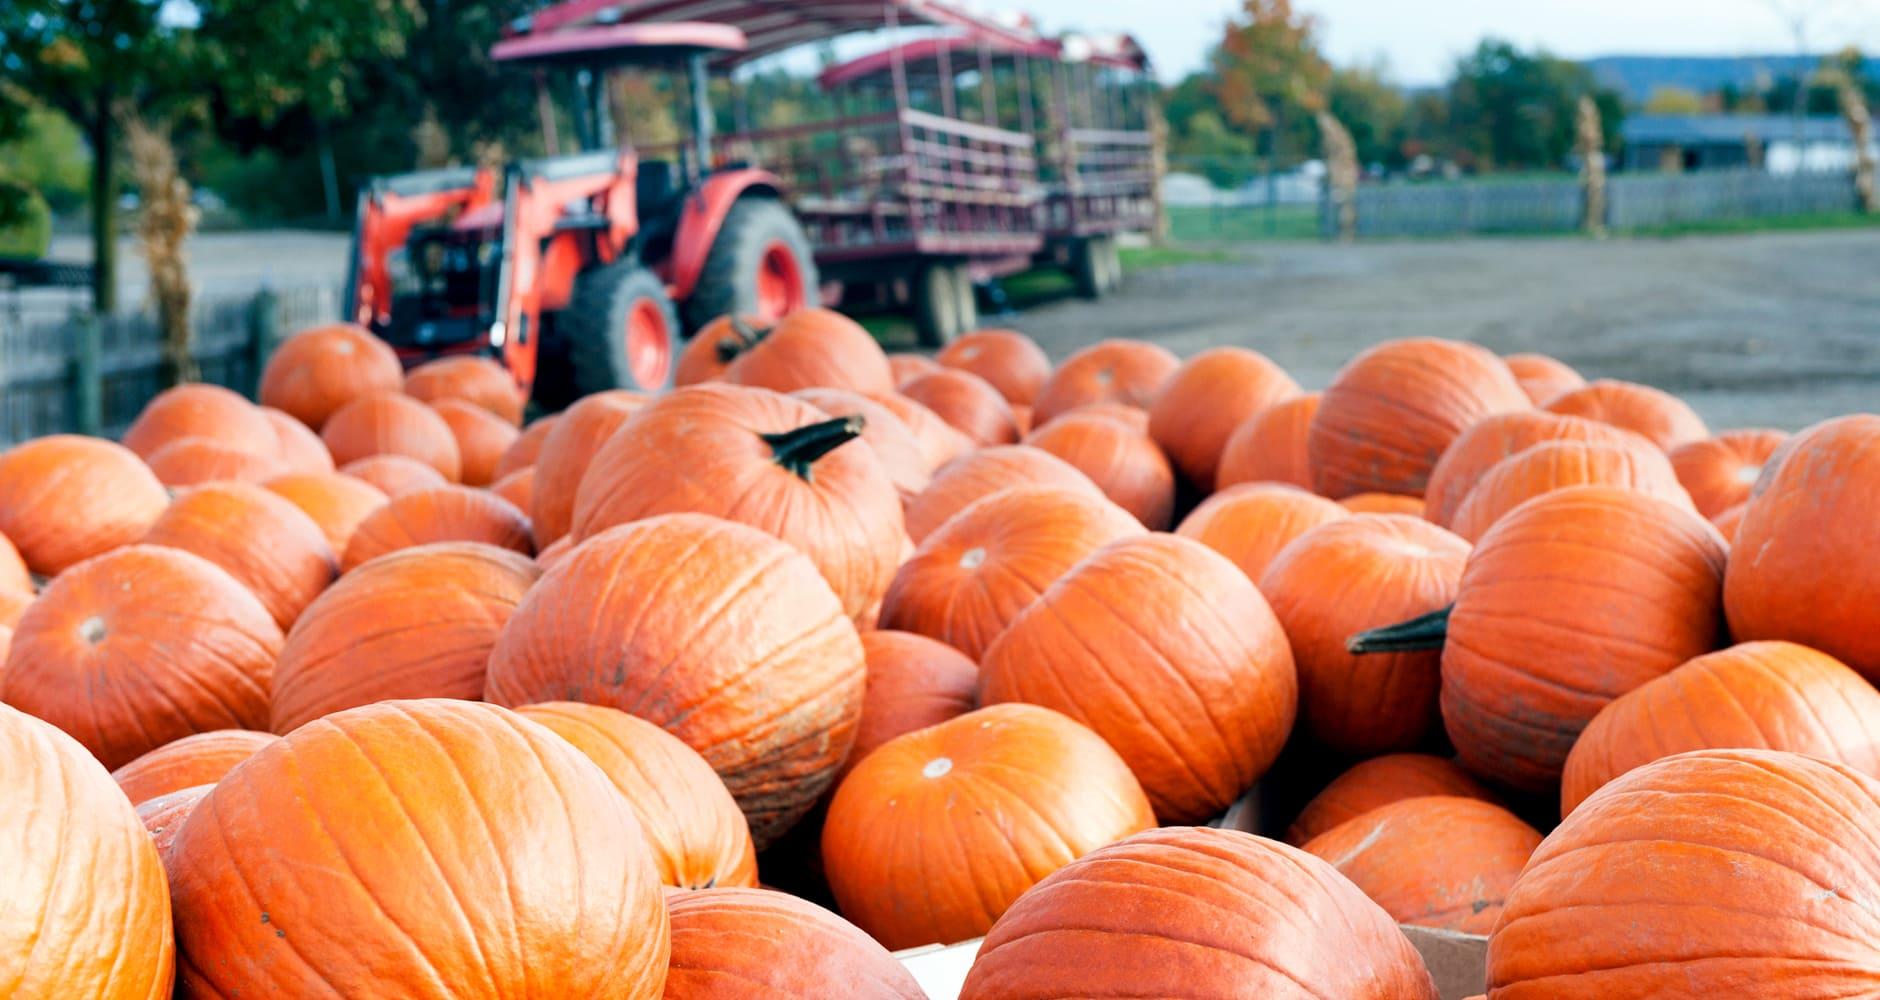 16 Little Known Pumpkin Factsimage preview